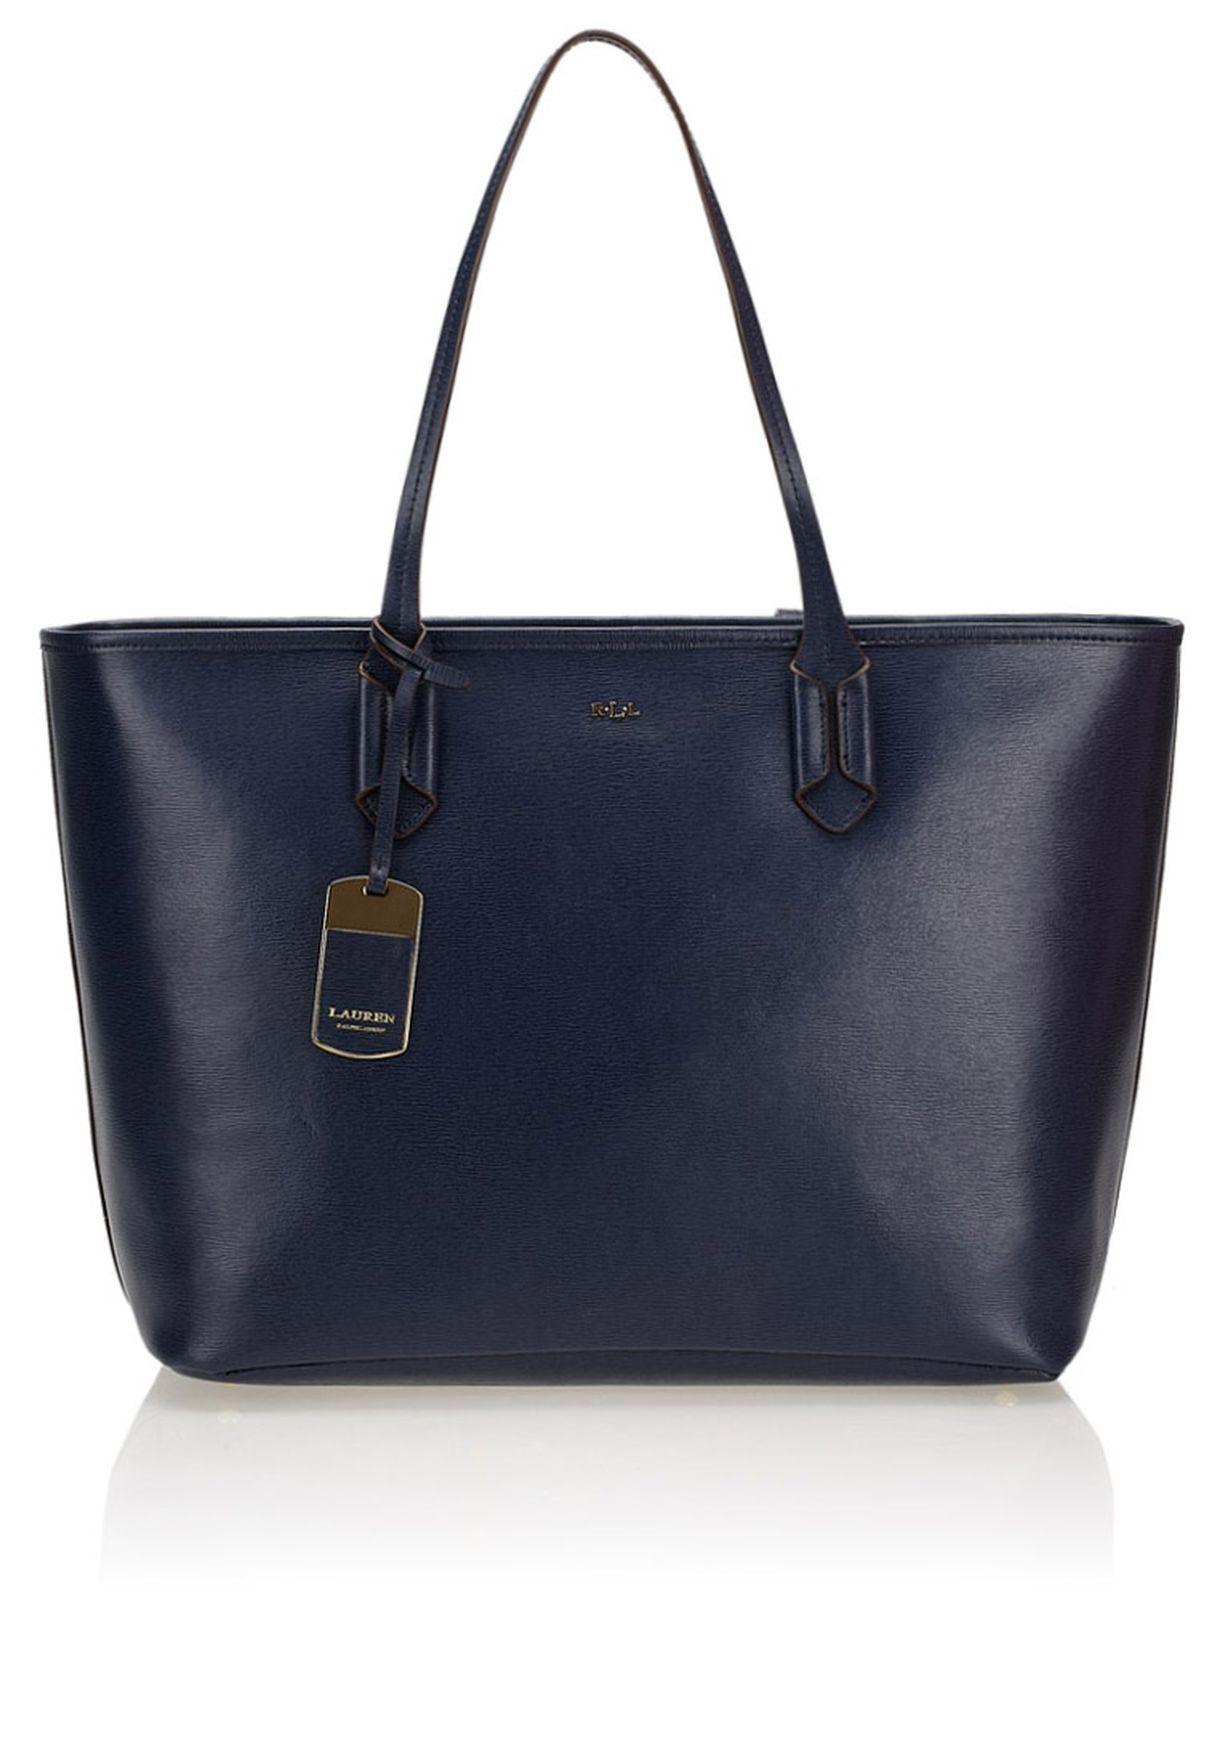 Shop Lauren Ralph Lauren blue Tate Tote 431186102Q65 for Women in ... a7a8b3e400